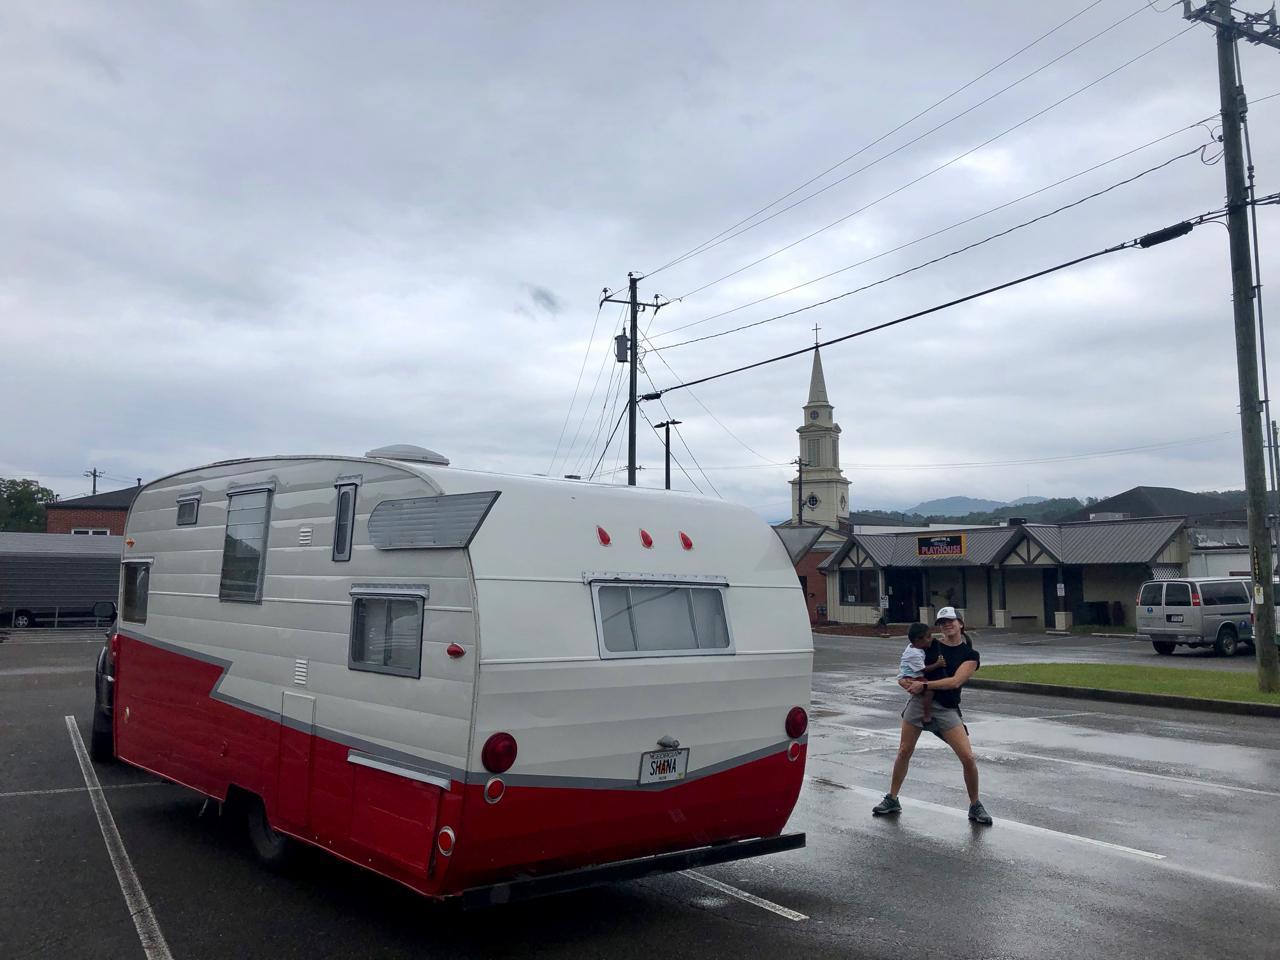 Retro-Camper-in-Downtown-Ellijay